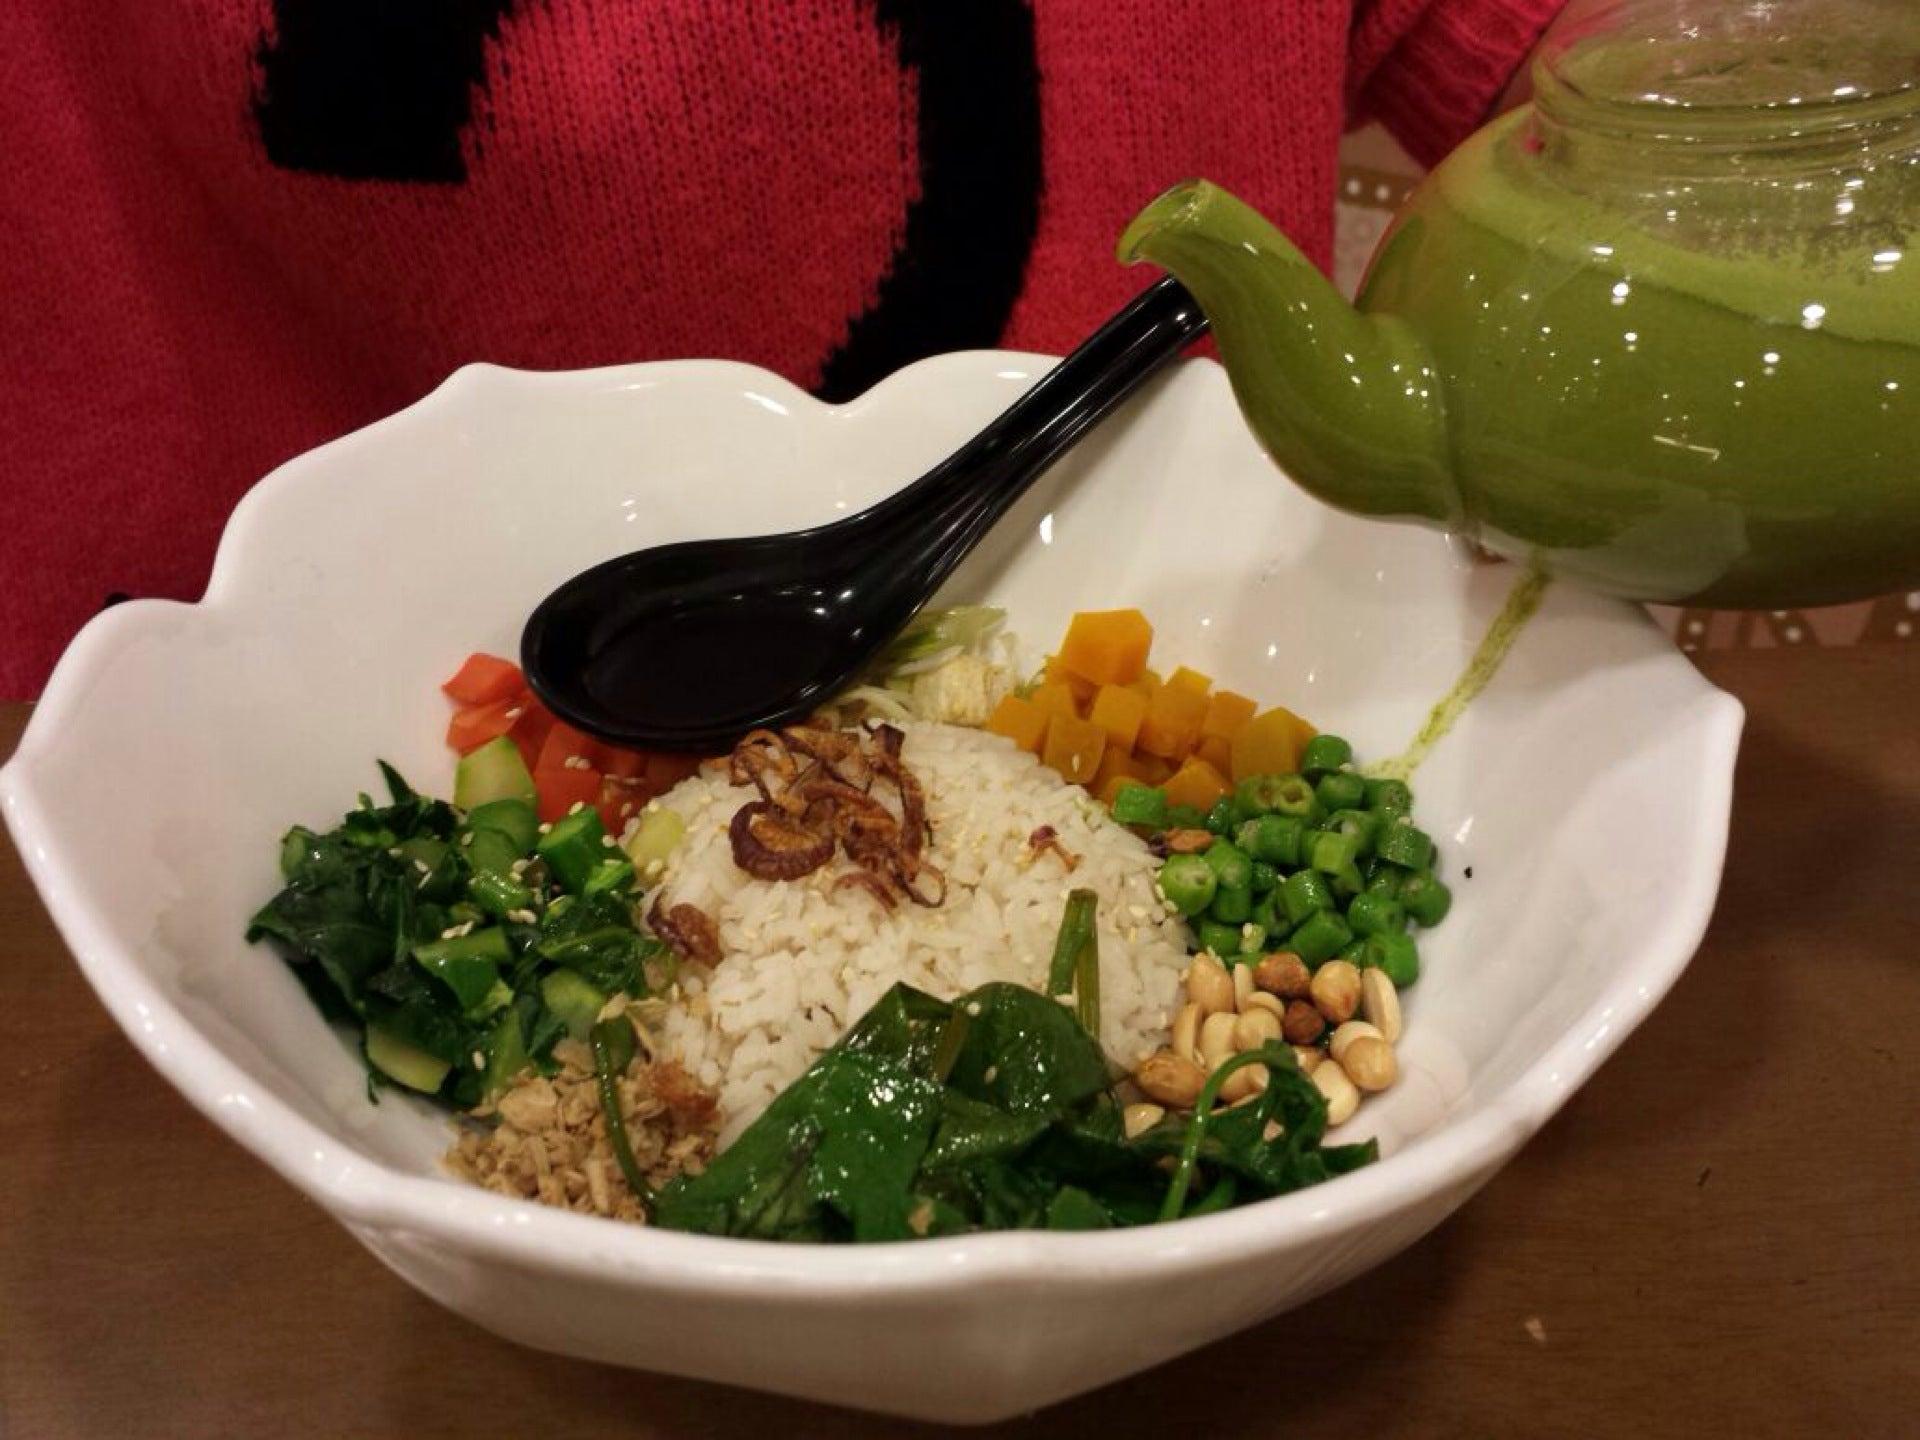 写真 -  富都 / 紫藤茶原|Restaurant - Klang Valley